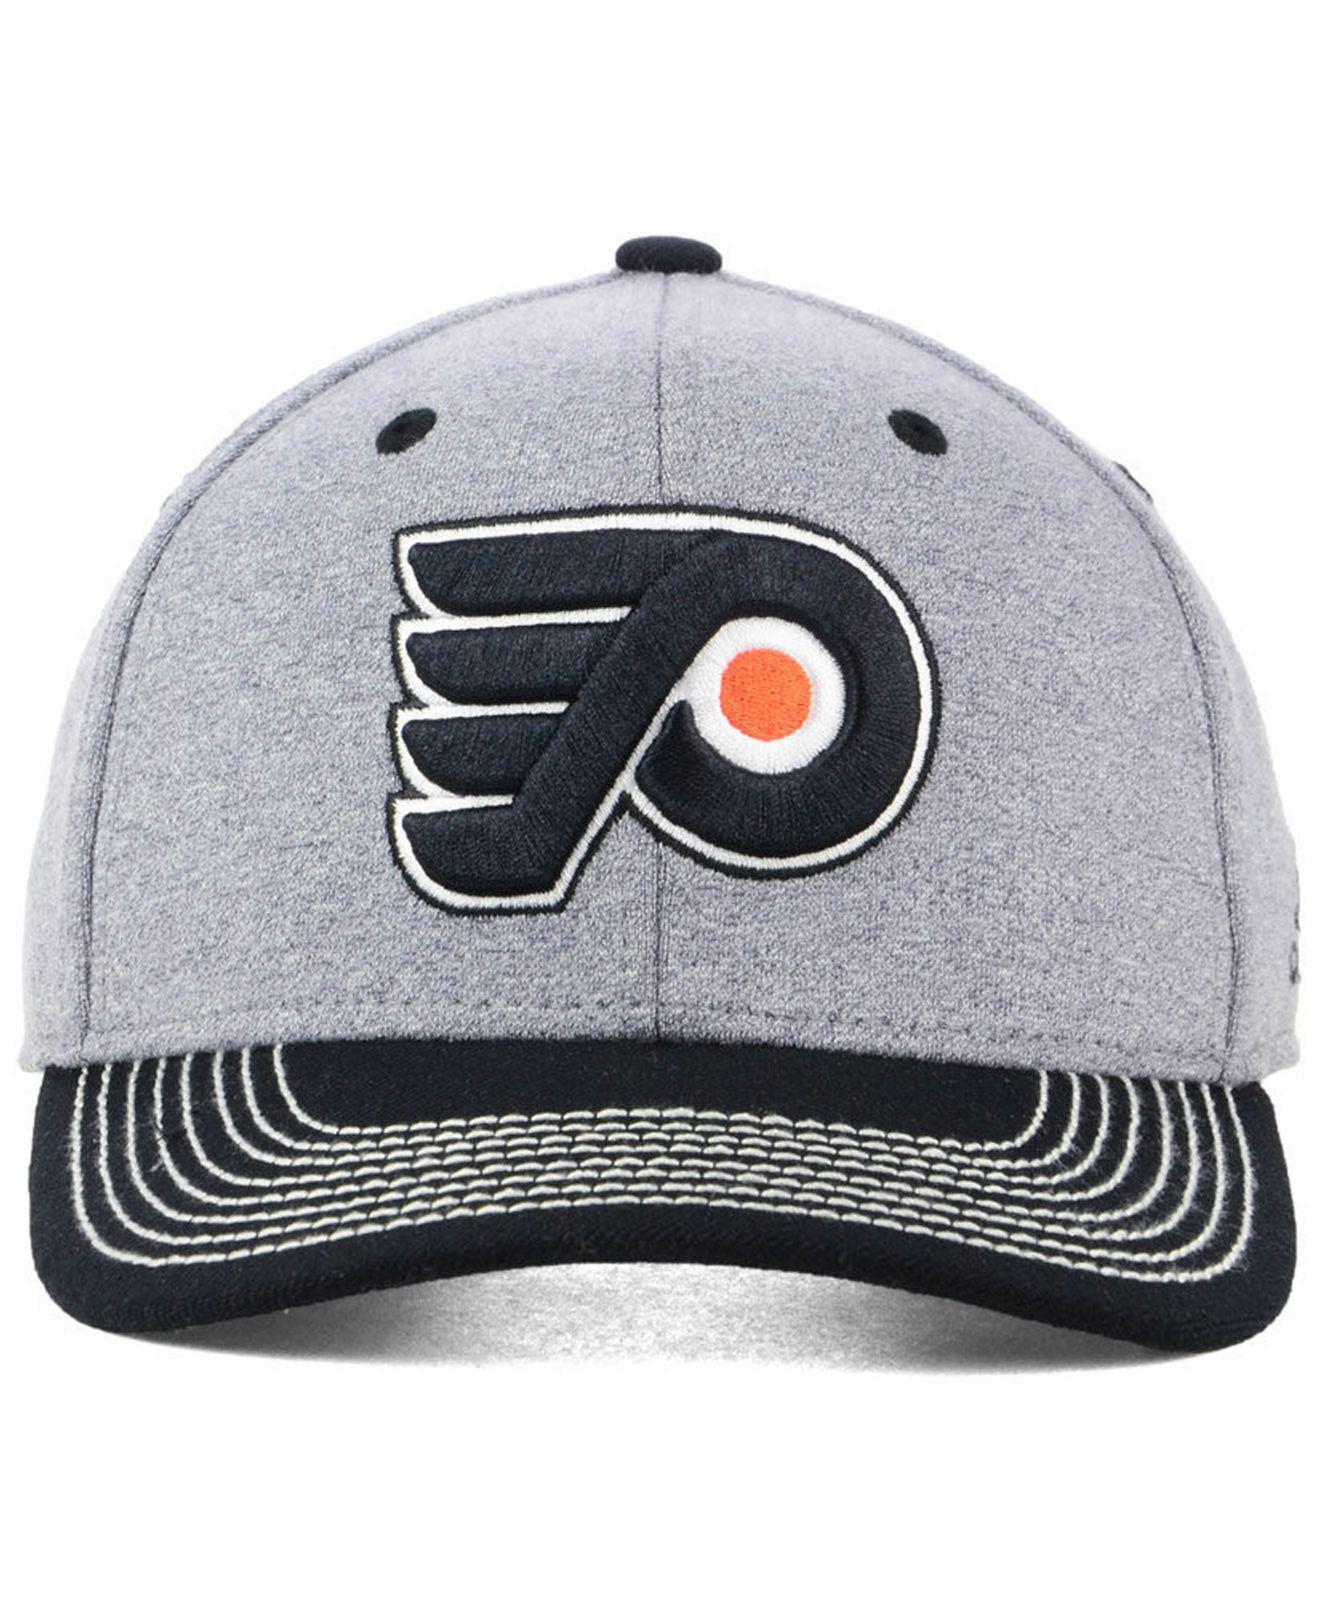 buy online d0a27 8f19e Lyst - adidas Philadelphia Flyers Heather Line Change Cap in Gray for Men